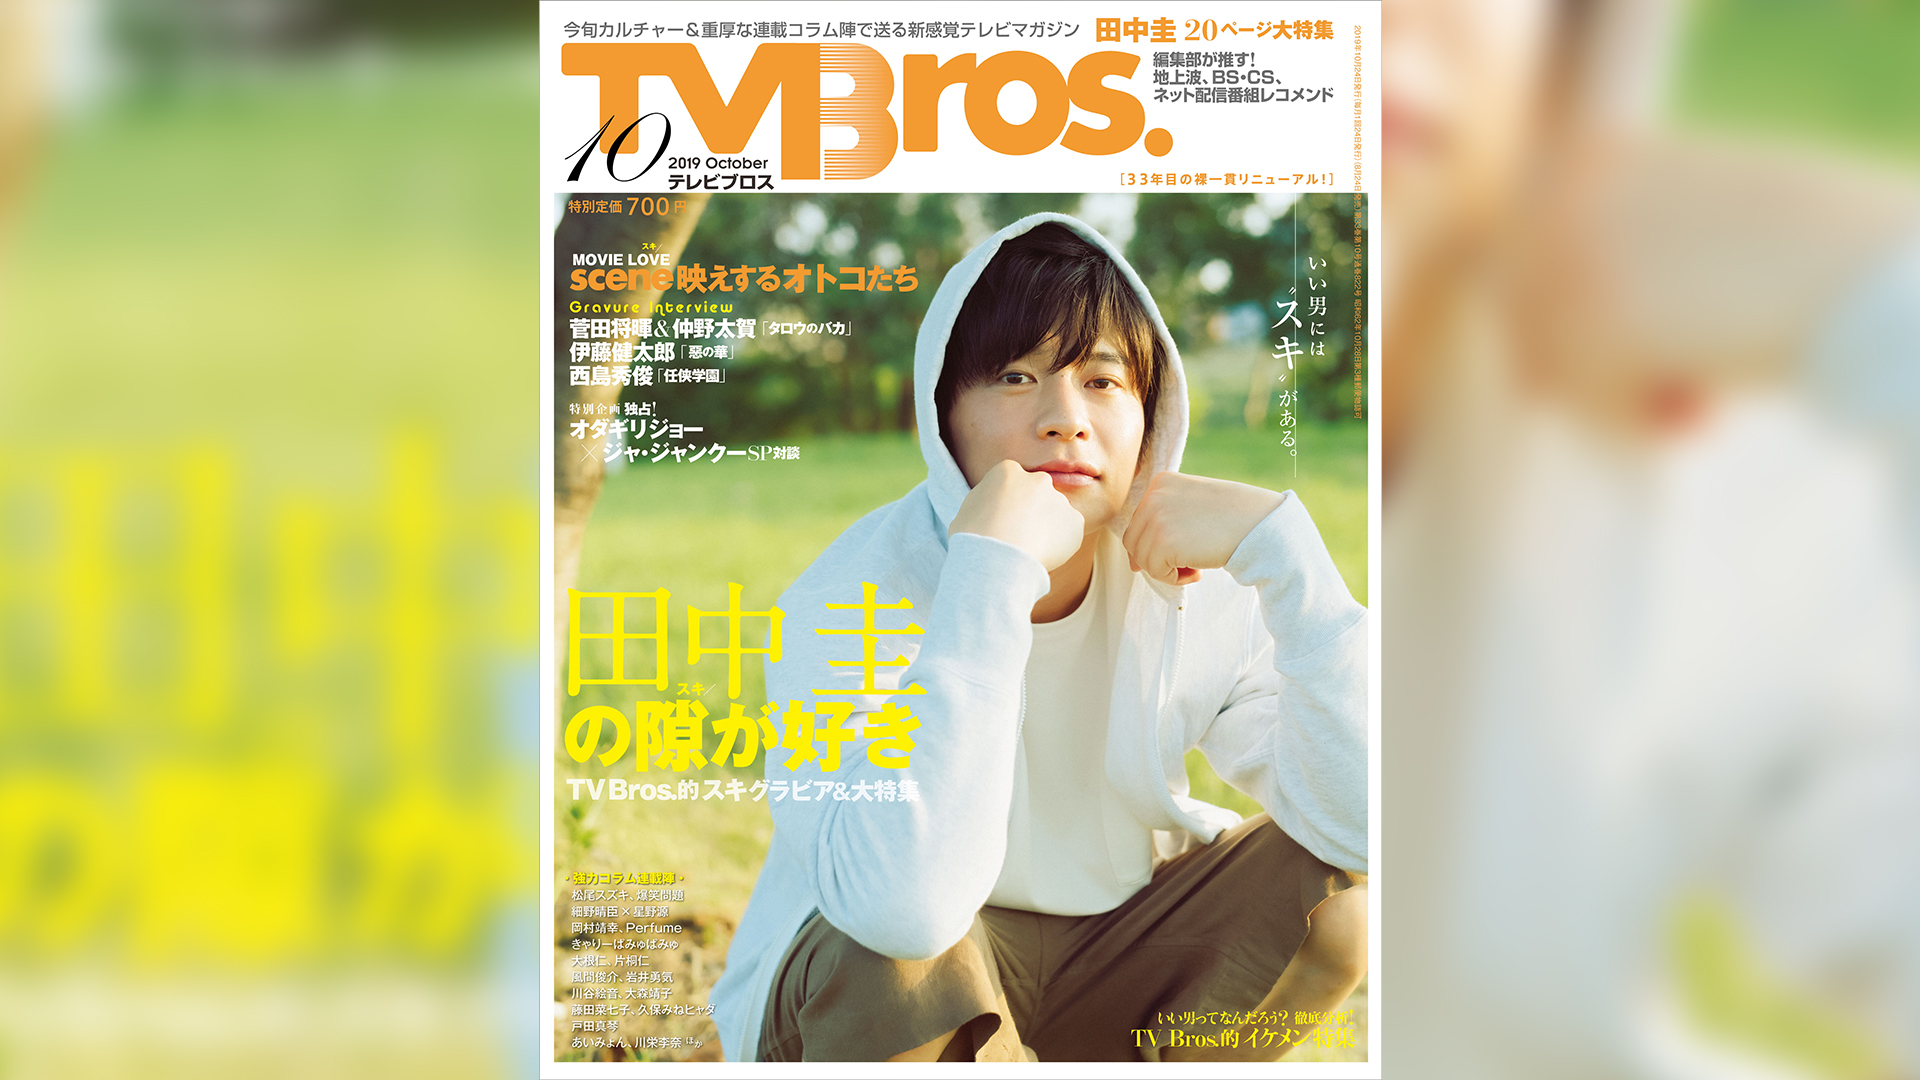 【「TV Bros. 10月号」に田中圭が登場】他、新着トレンド8月22日